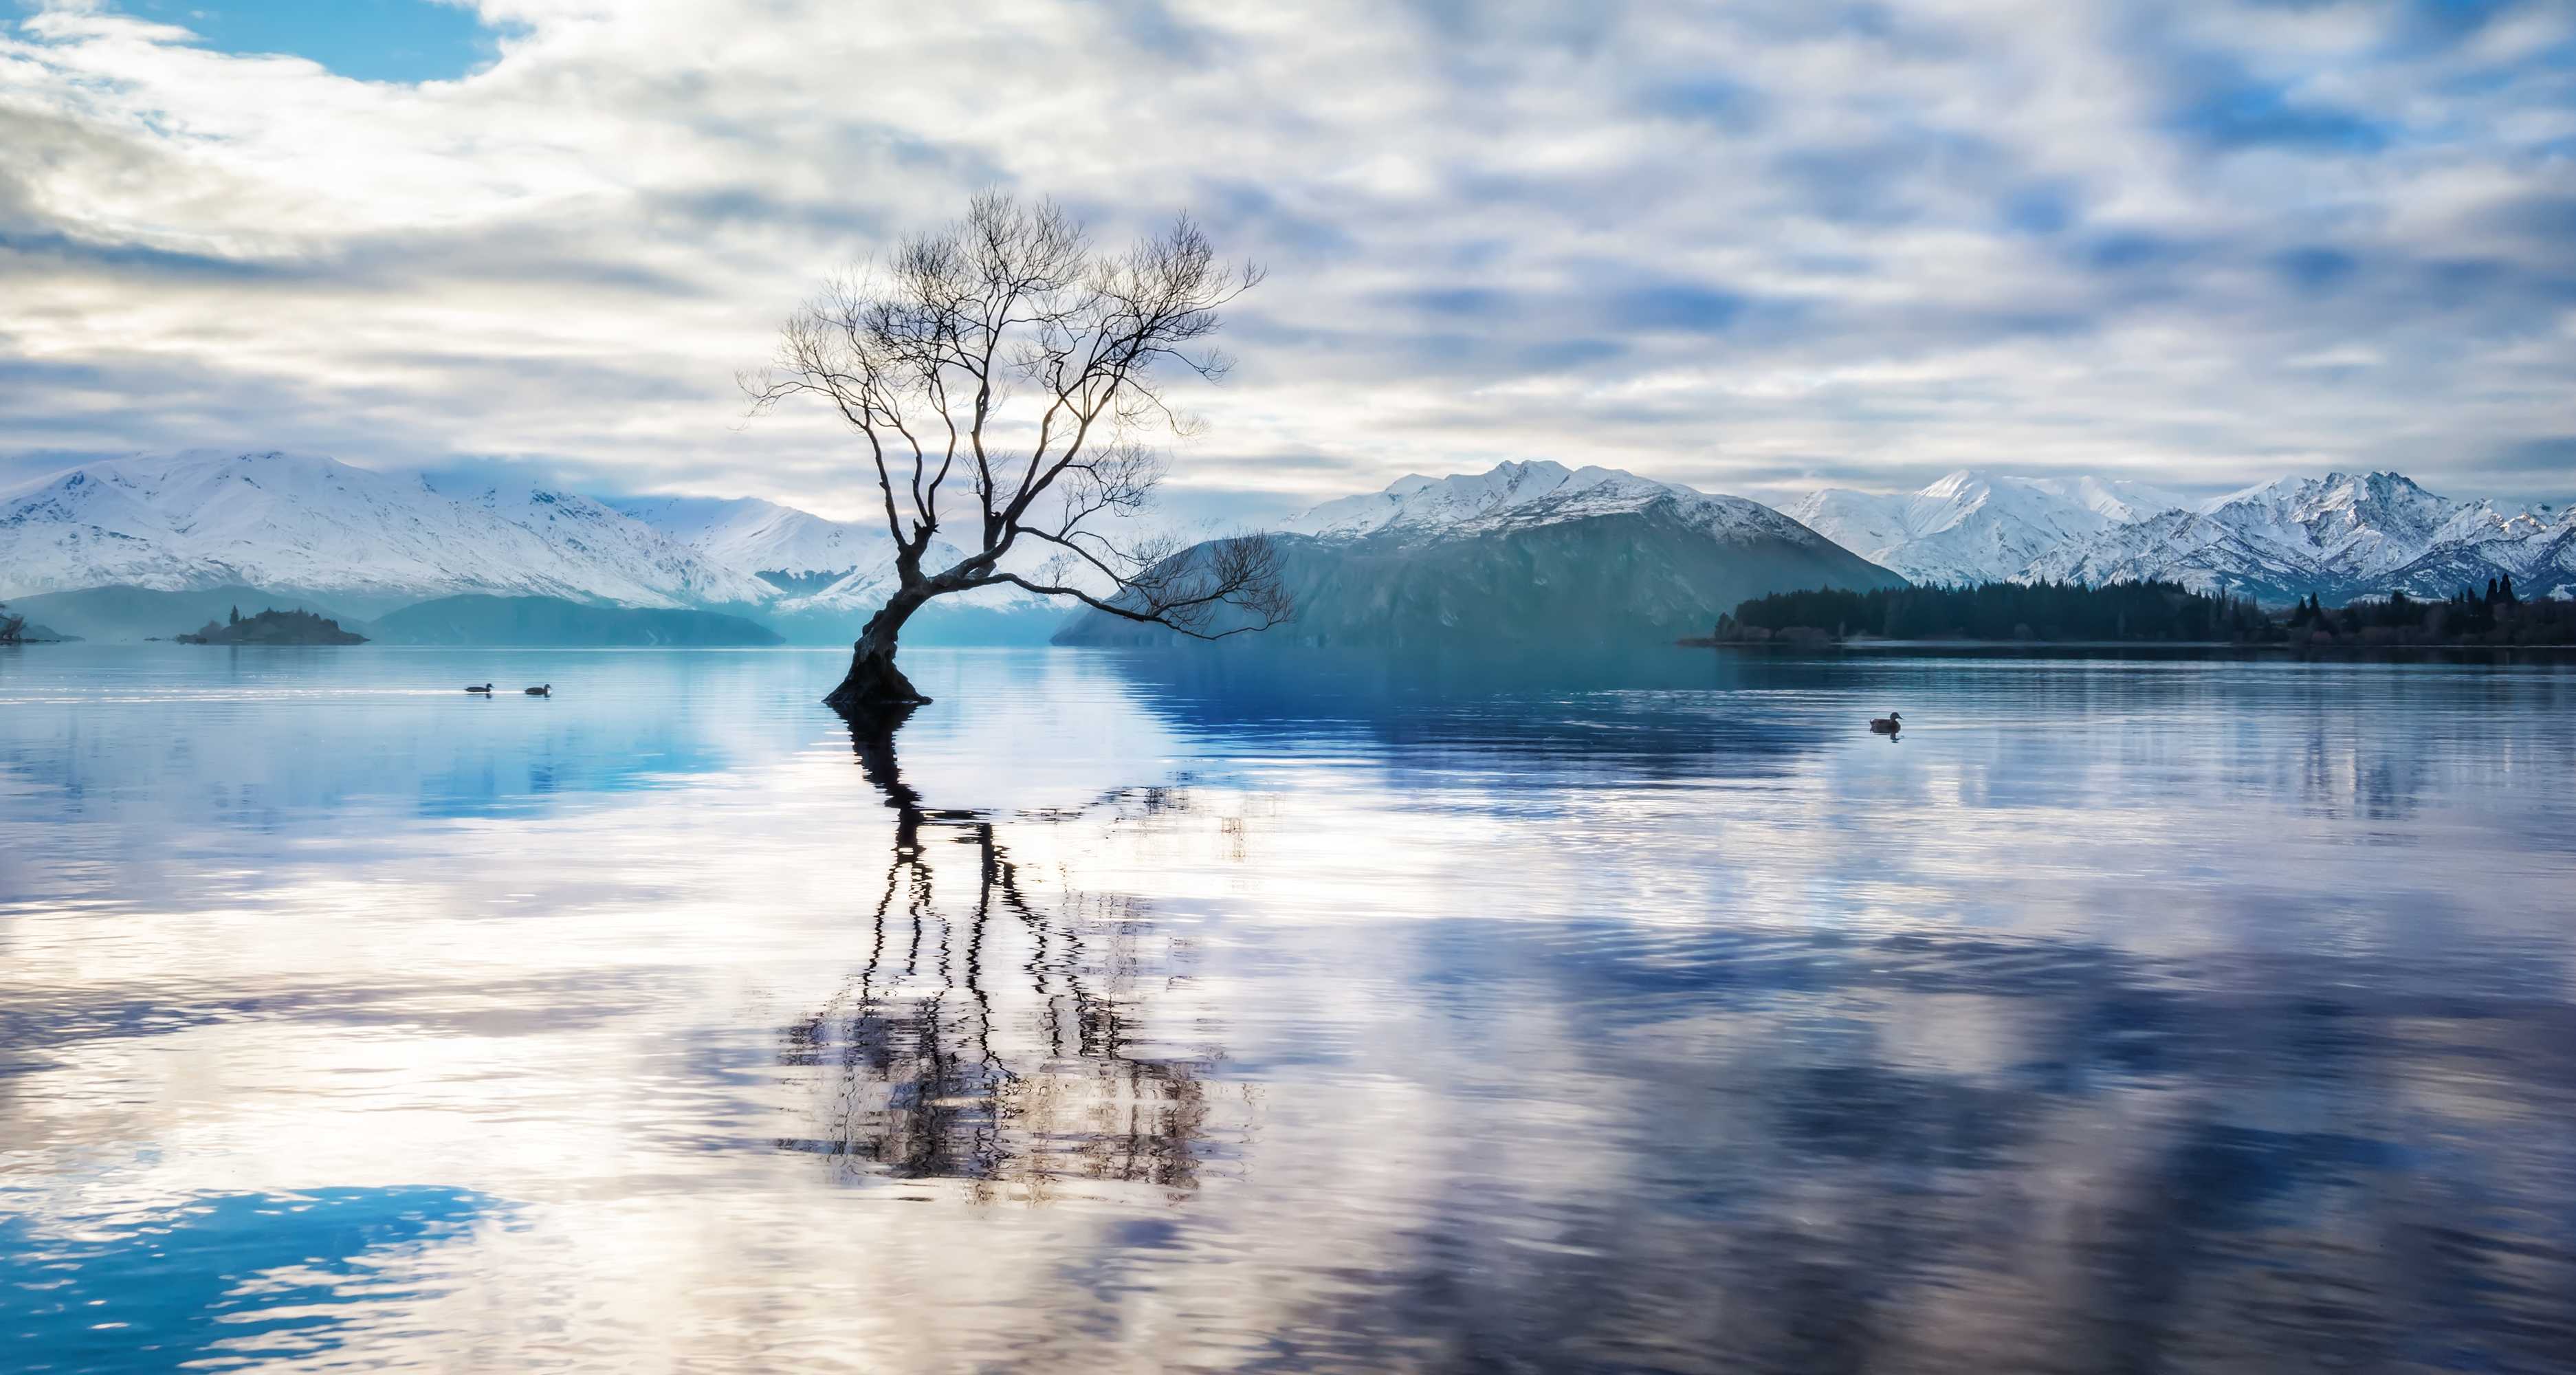 Lake Landscape Lonely Tree Mountain Reflection Tree 3747x2000